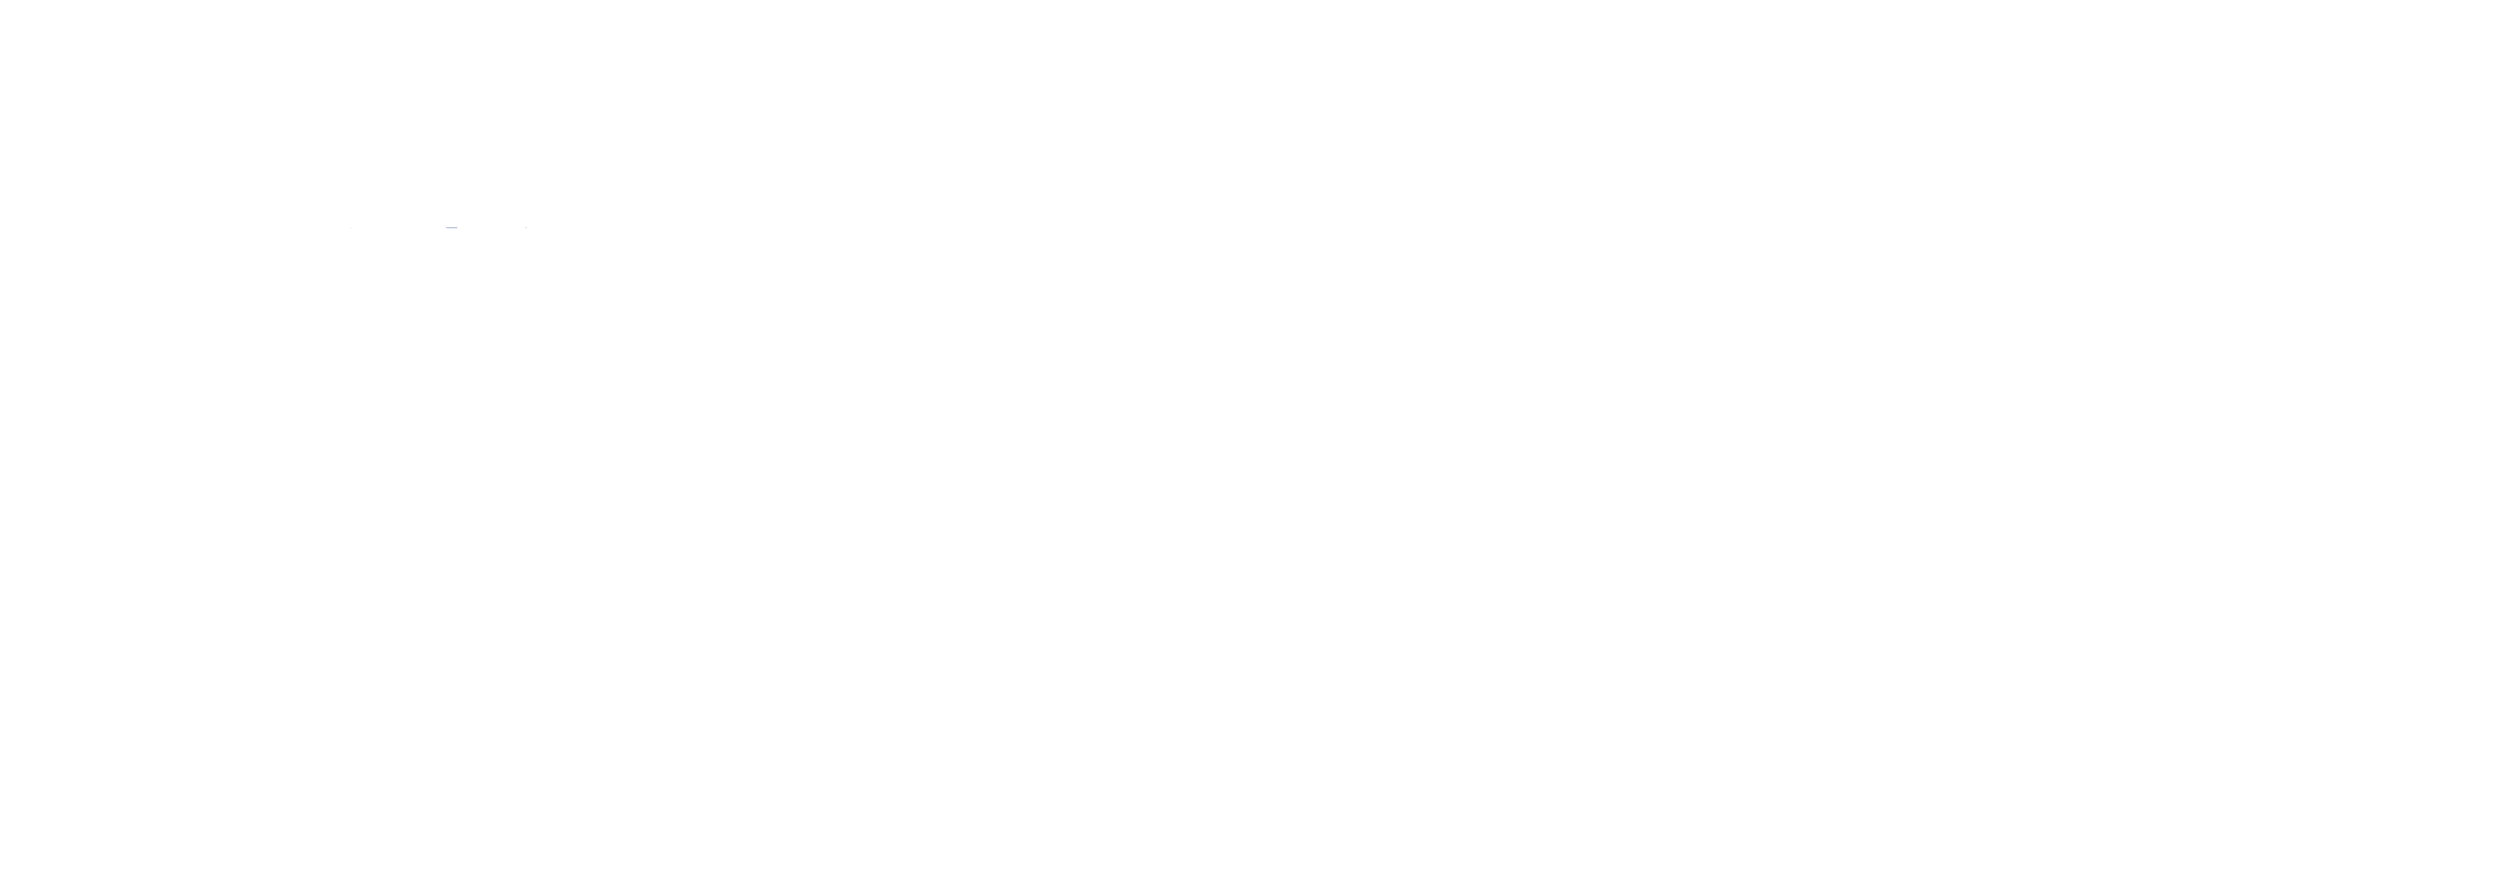 Lingineering_Logo_White.png